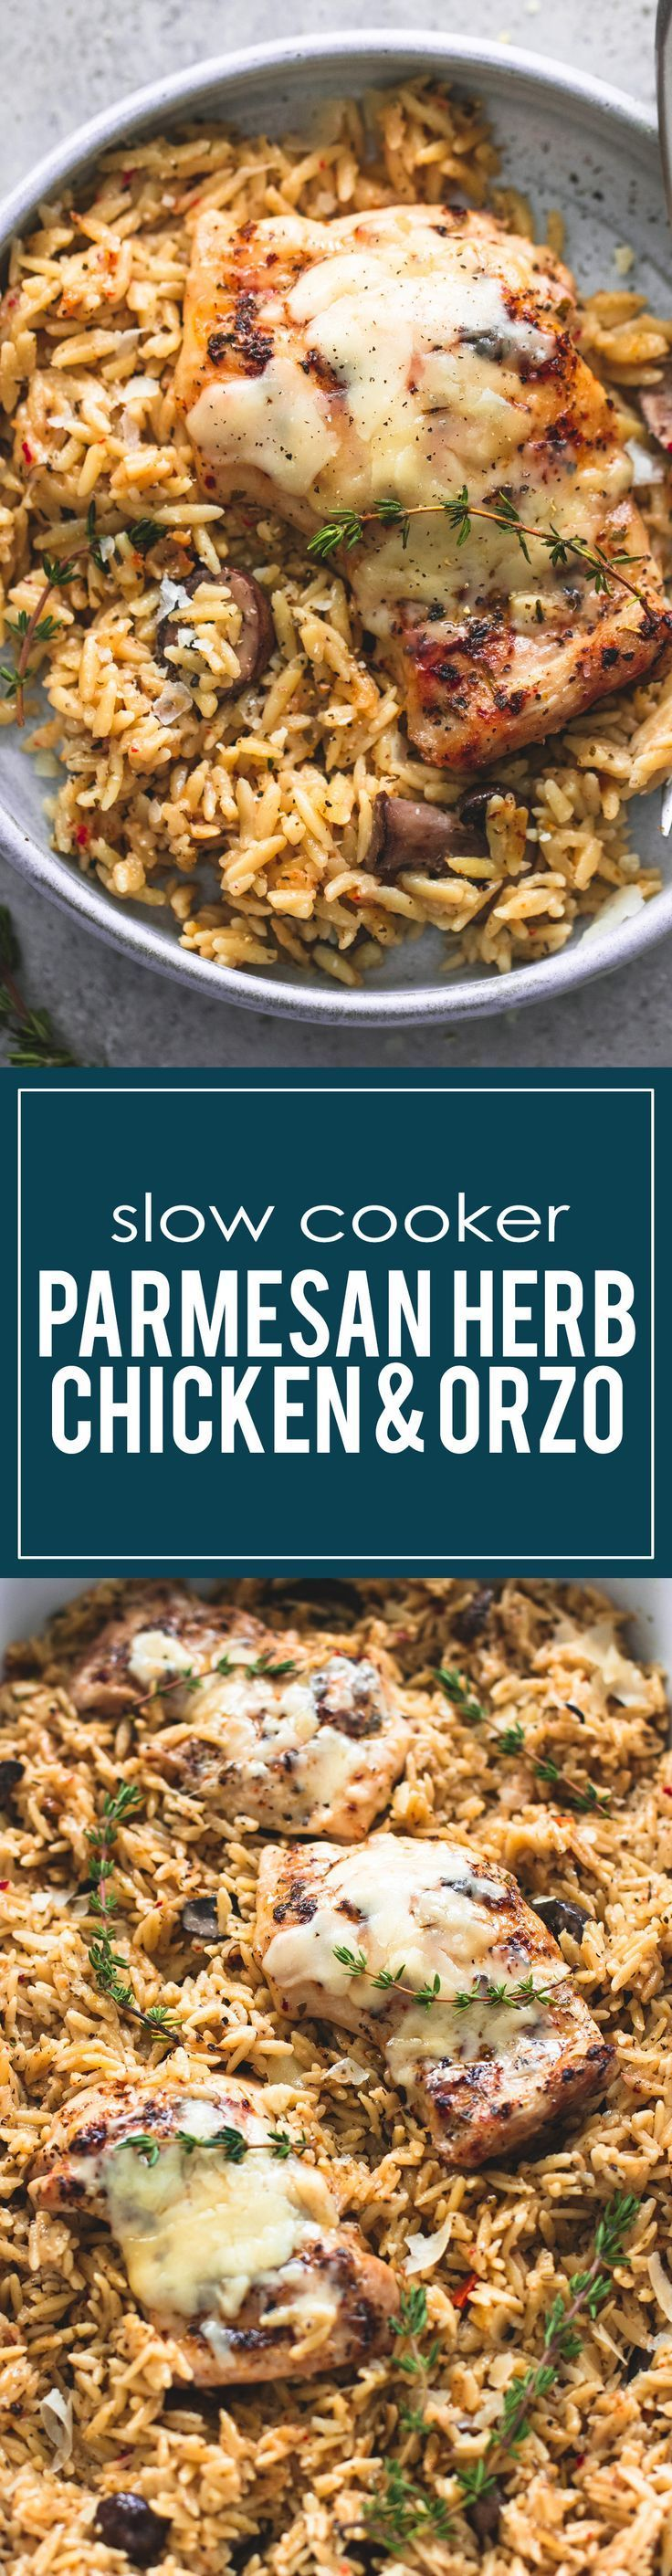 Easy Slow Cooker Parmesan Herb Chicken & Orzo | http://lecremedelacrumb.com